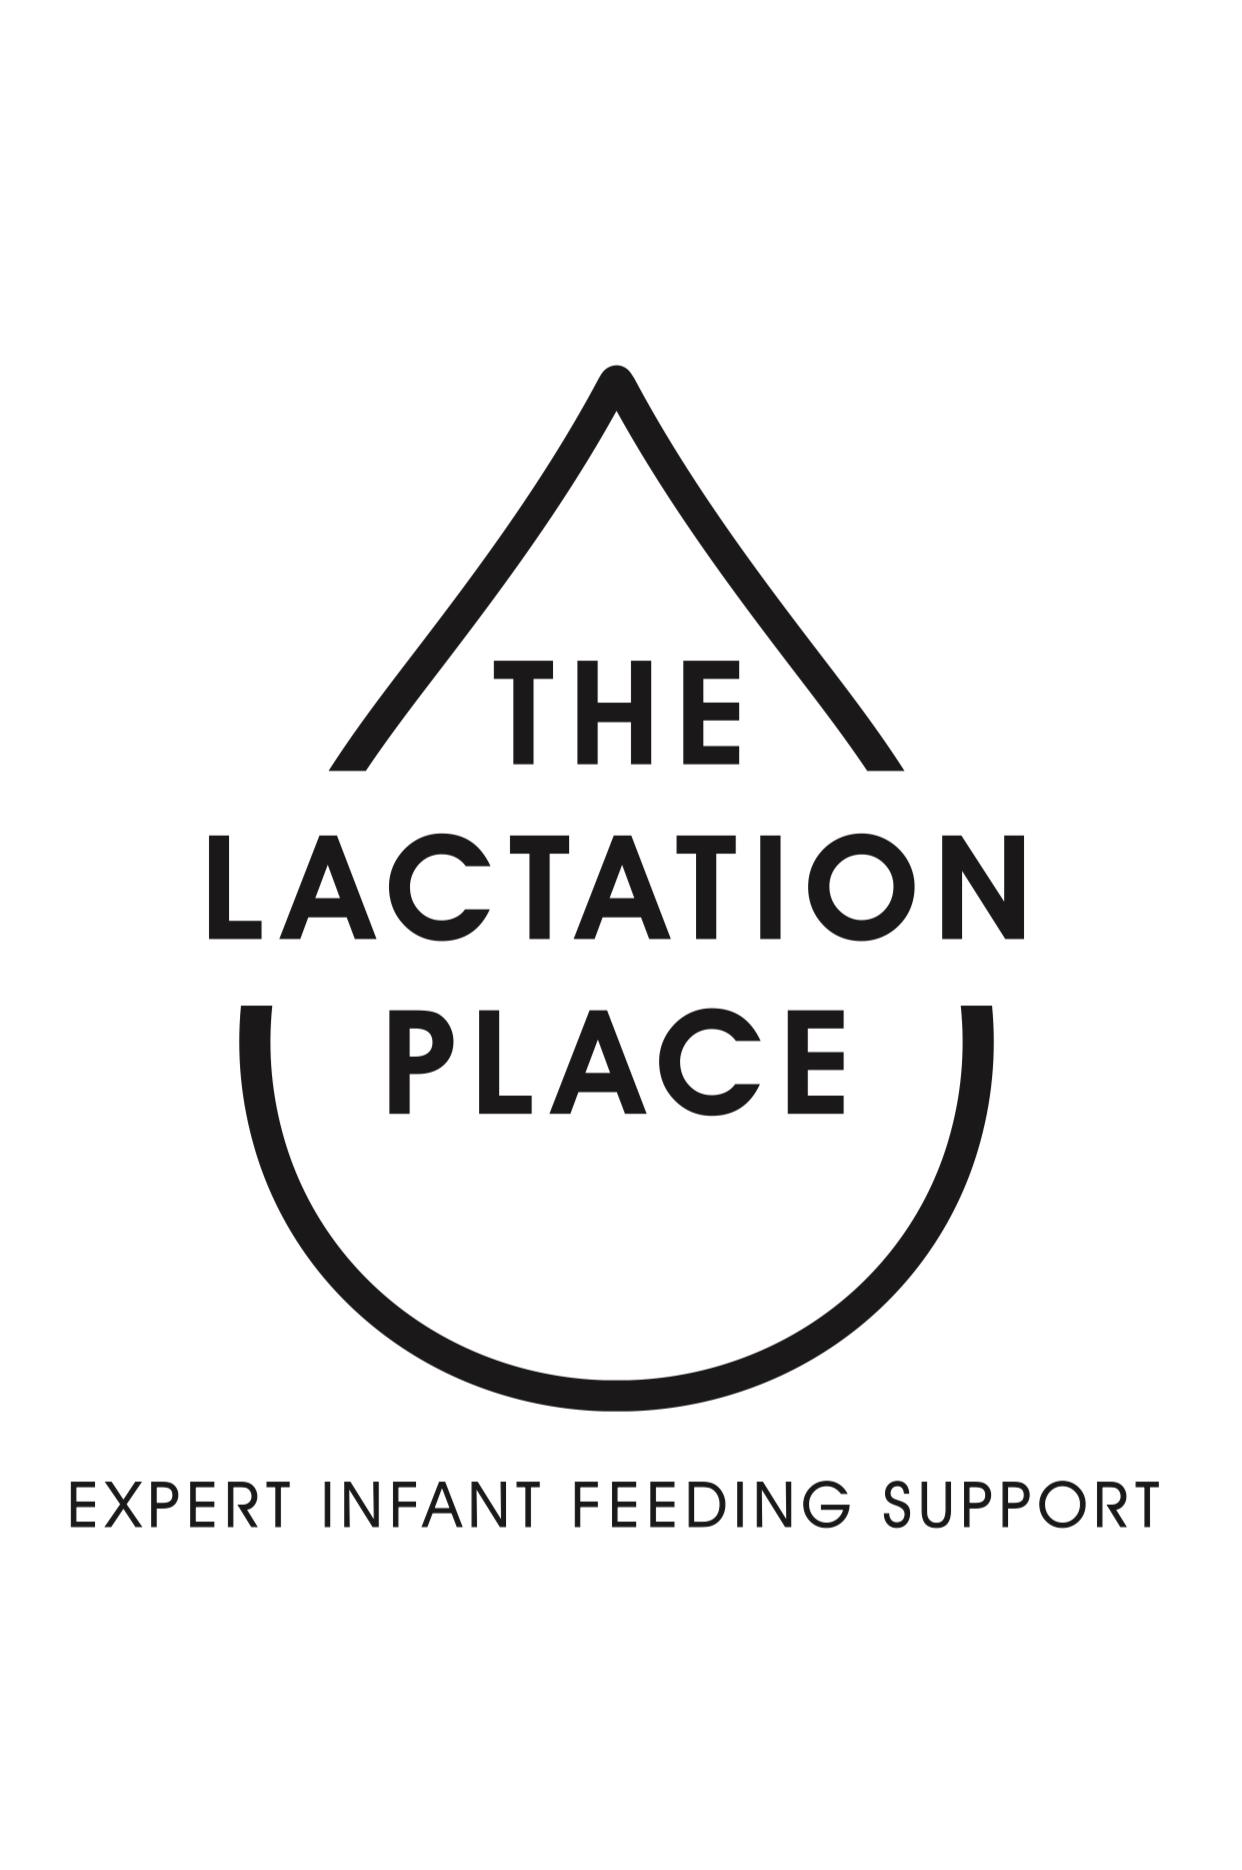 INSURANCE INFORMATION — The Lactation Place